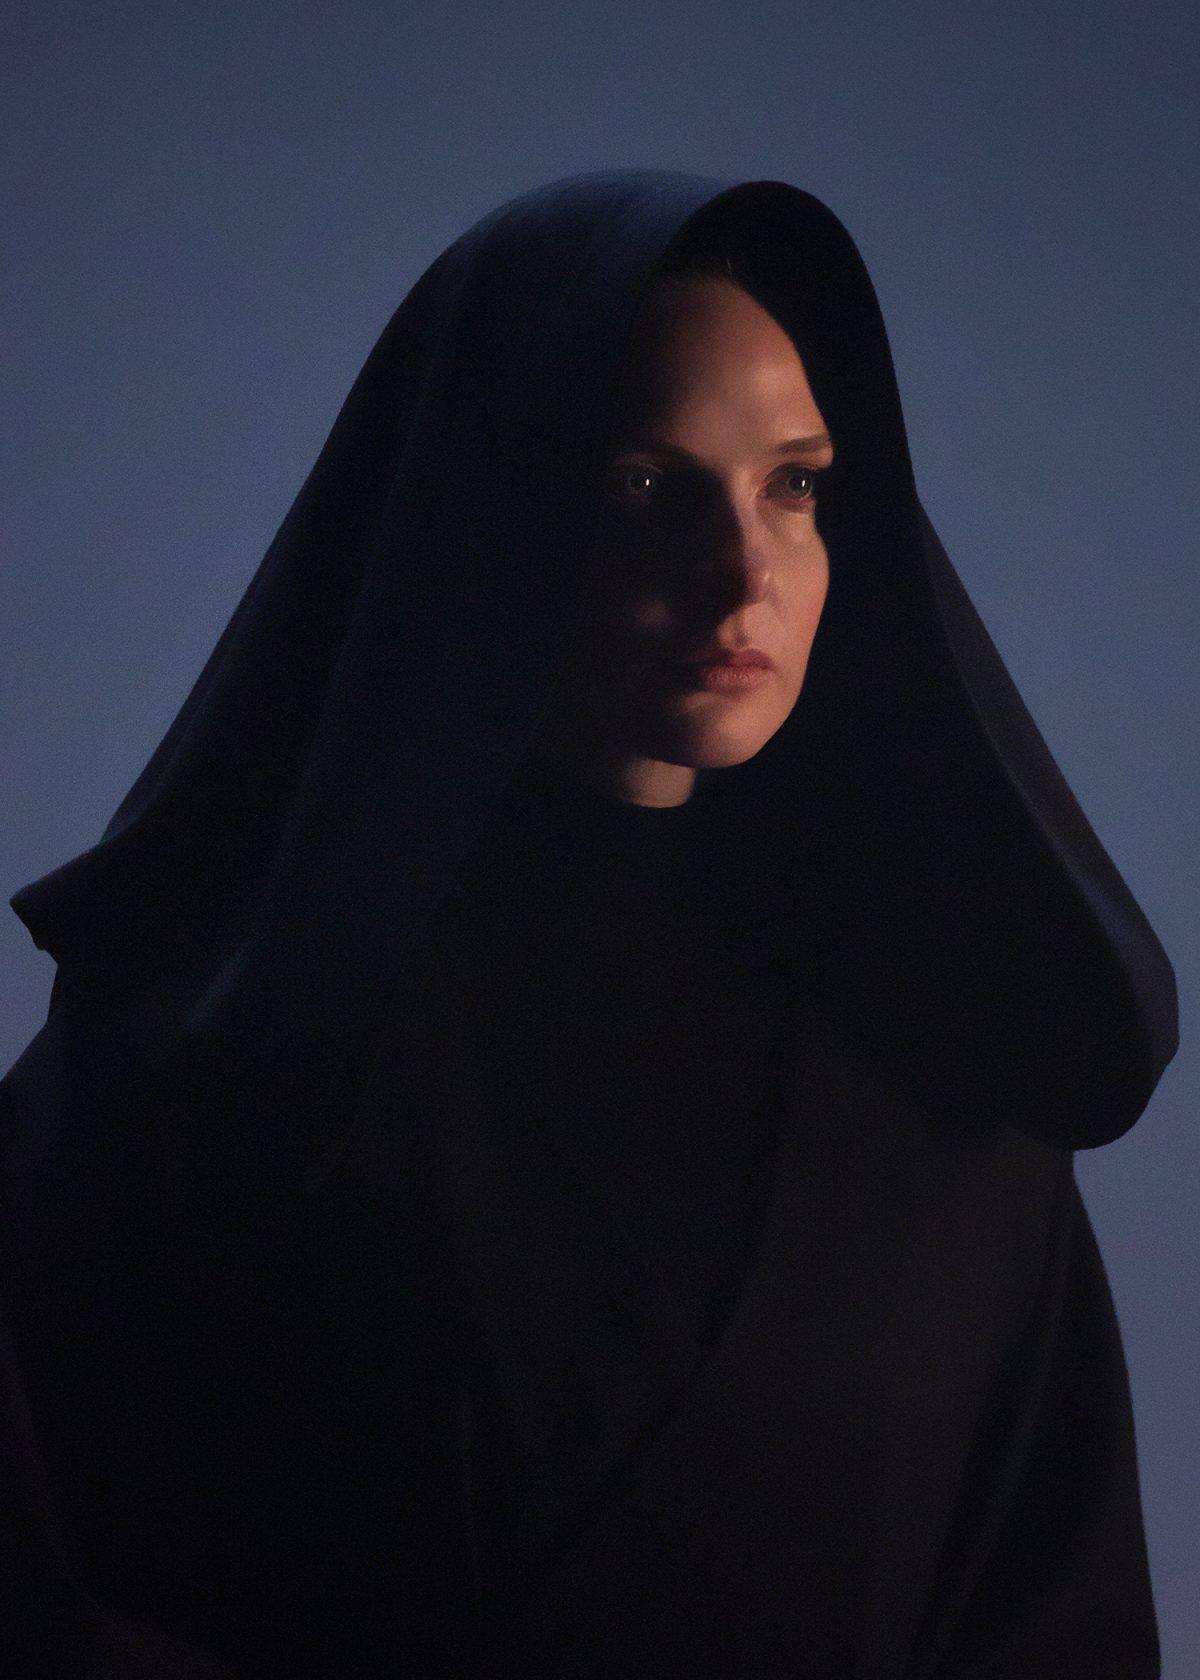 REBECCA FERGUSON als Lady Jessica in Dune - neuer Film im Kino ab Dezember